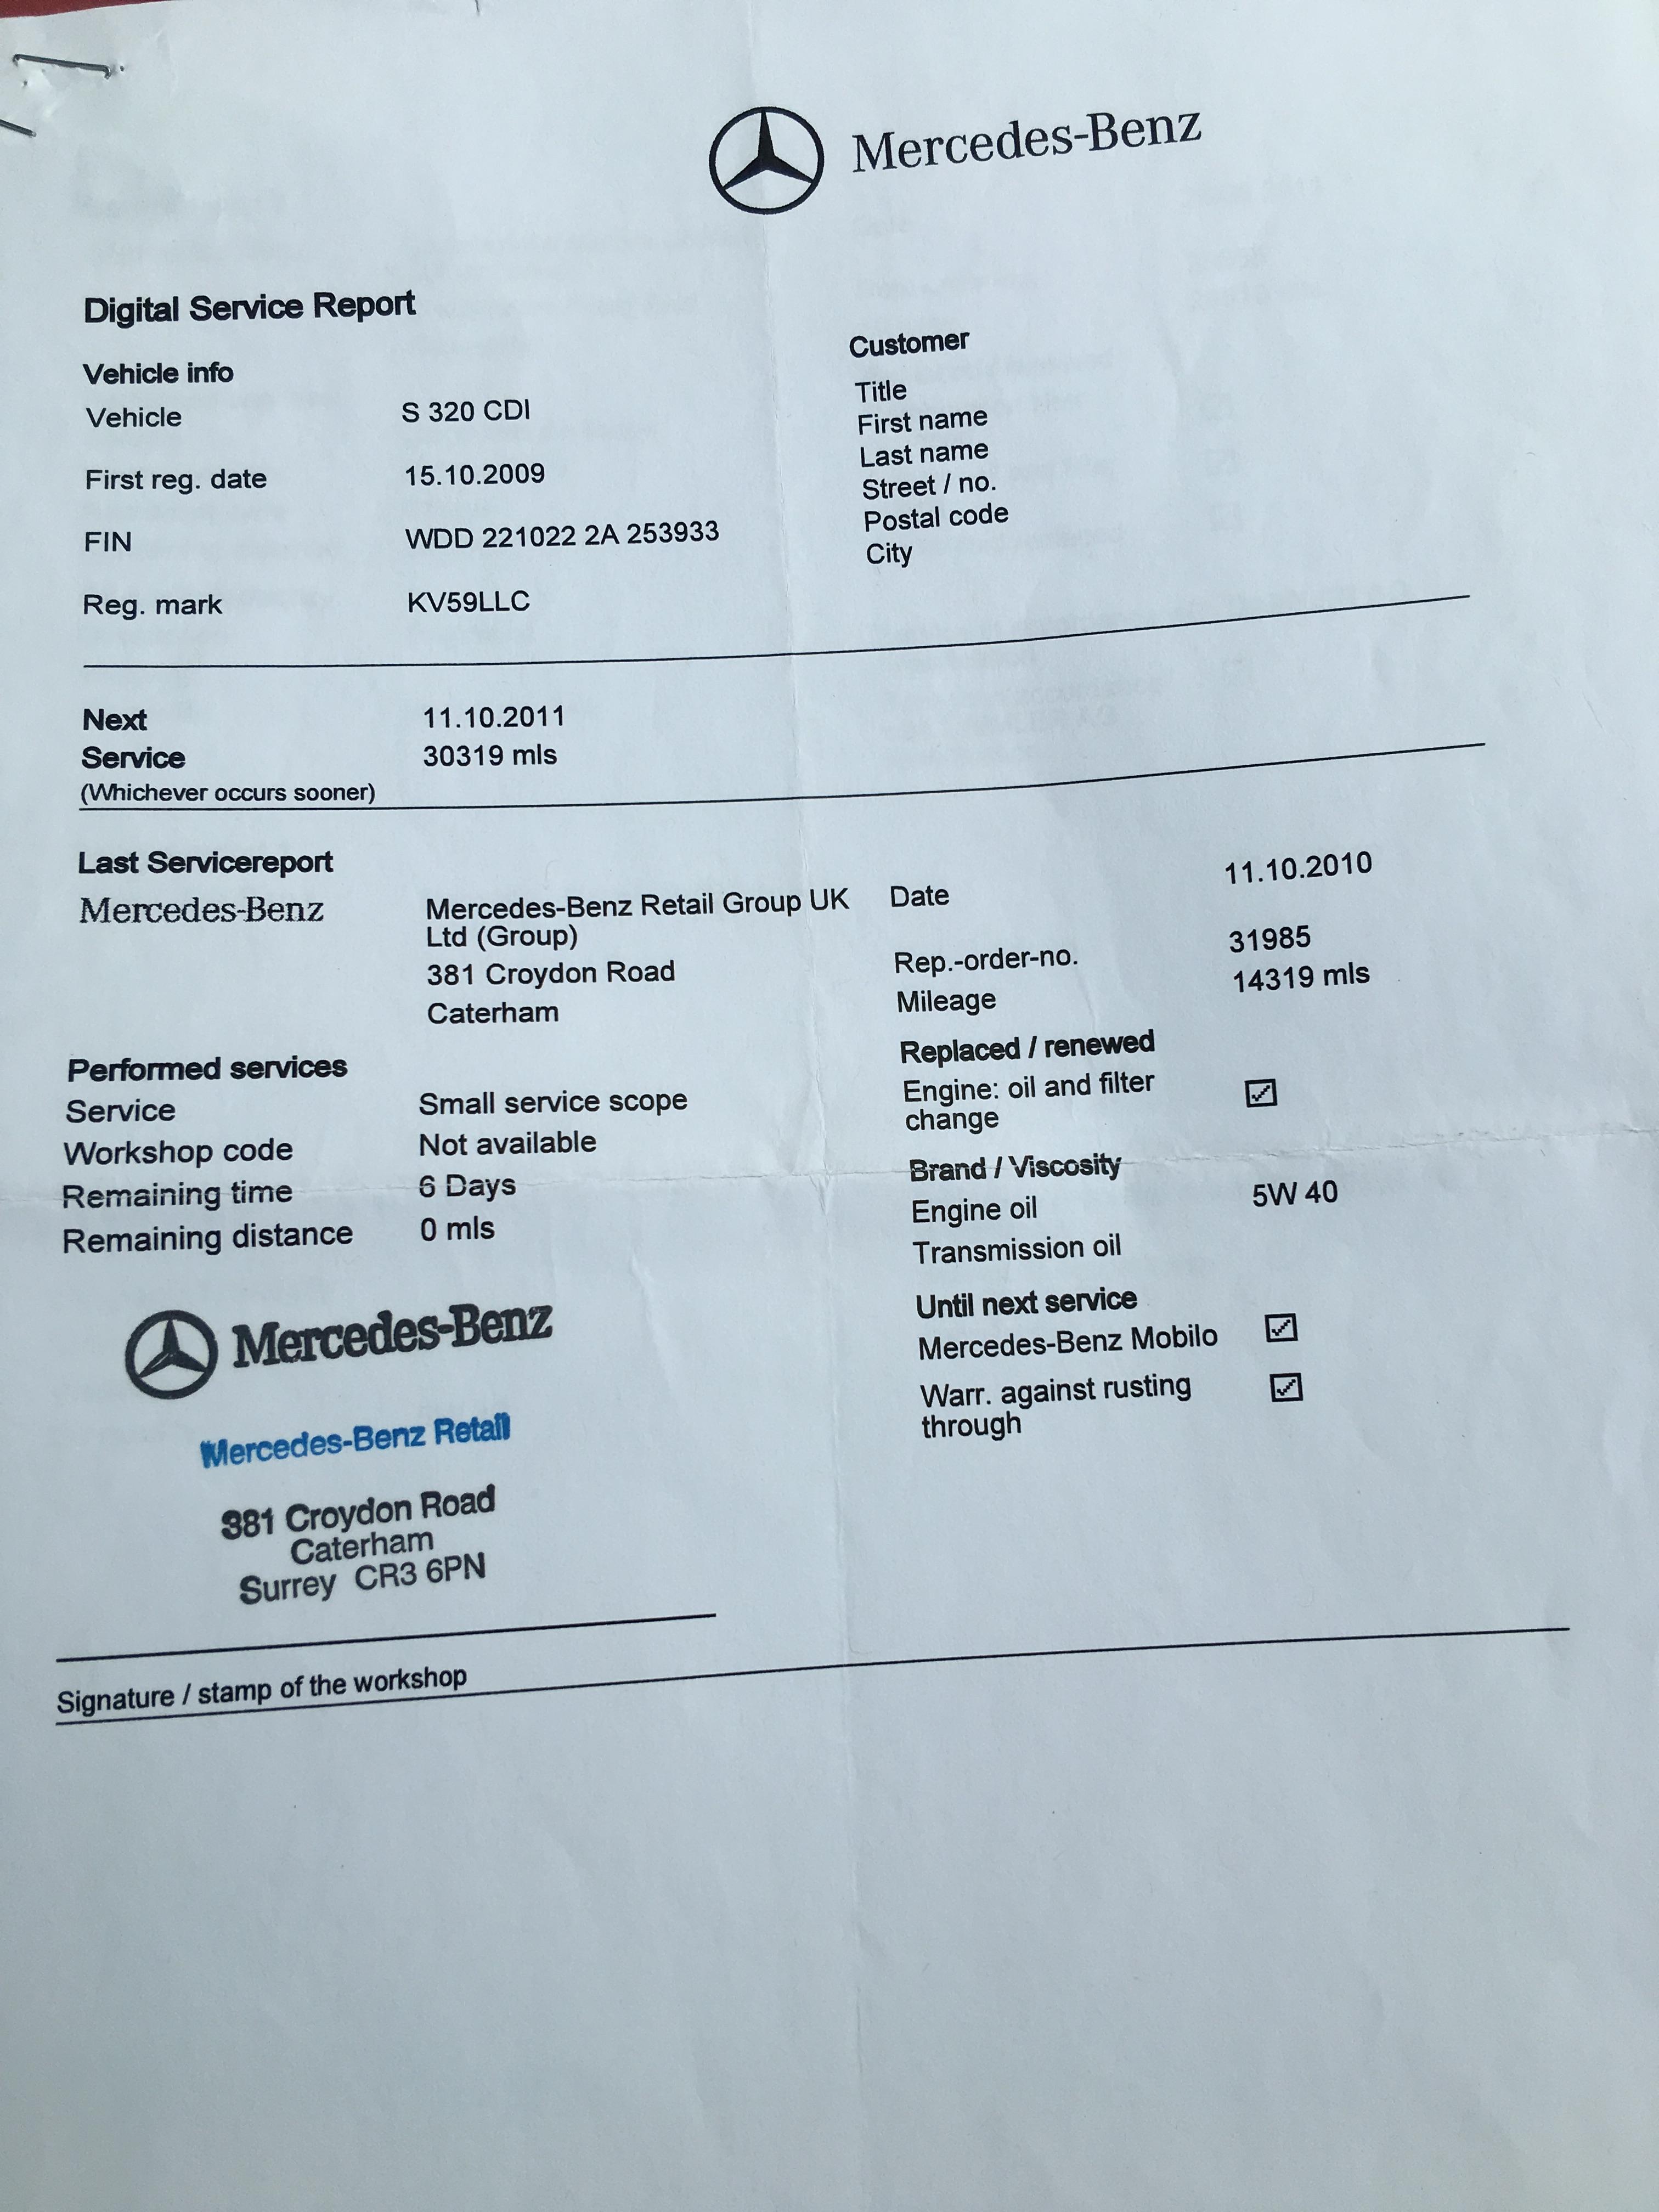 Reg 59 2009 mercedes benz s320 cdi auto log book present for Mercedes benz technical support